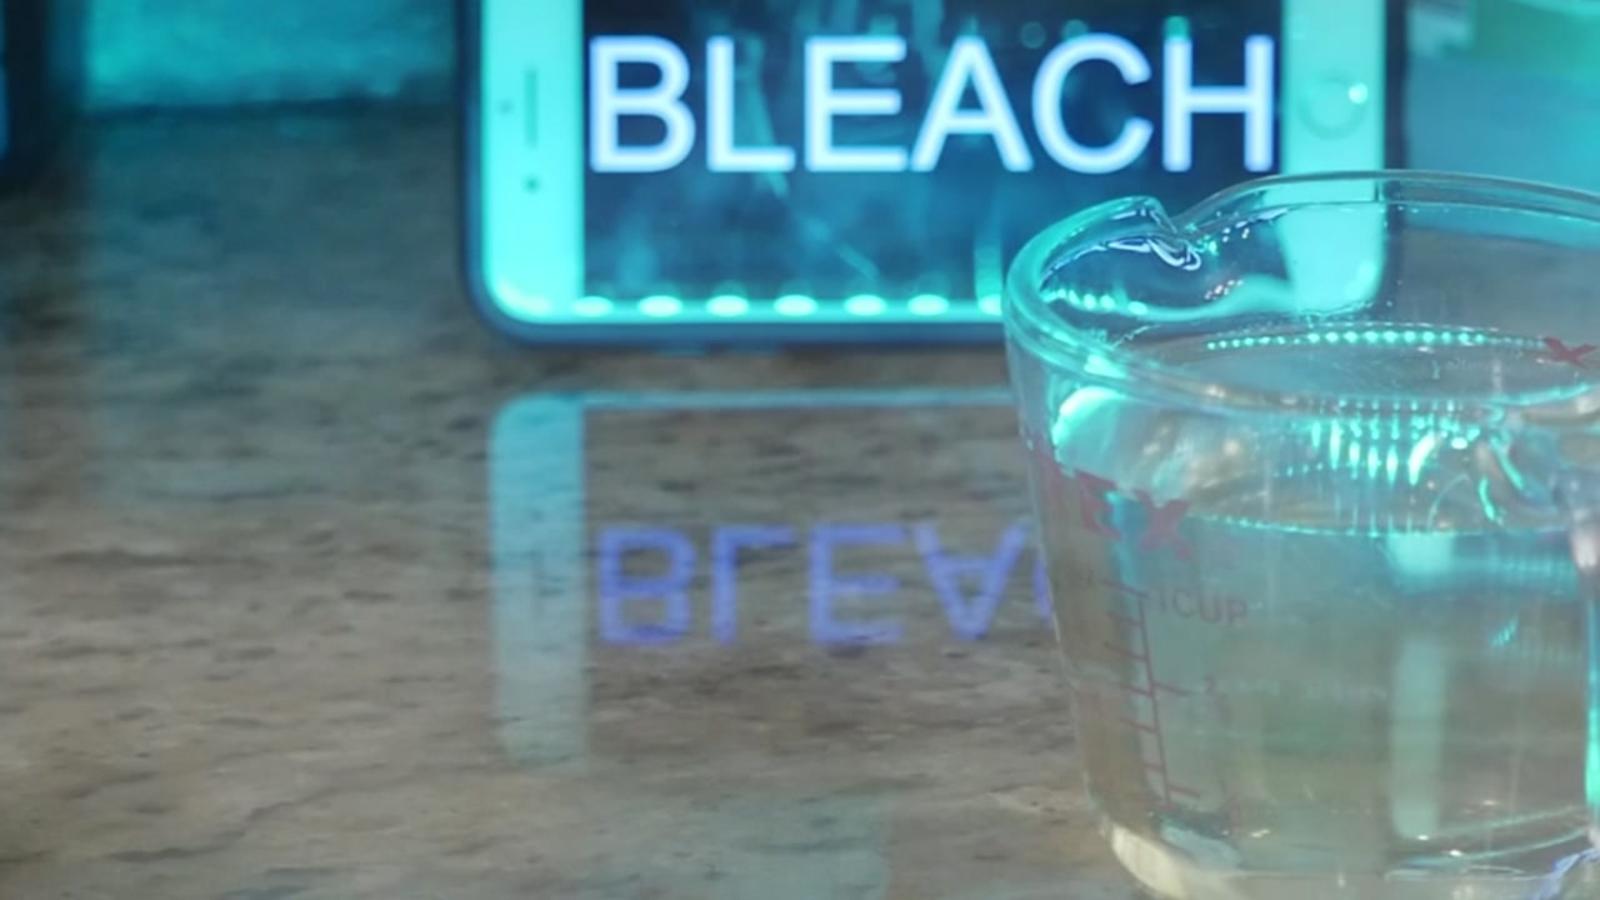 Bleach you drinking will kill 4